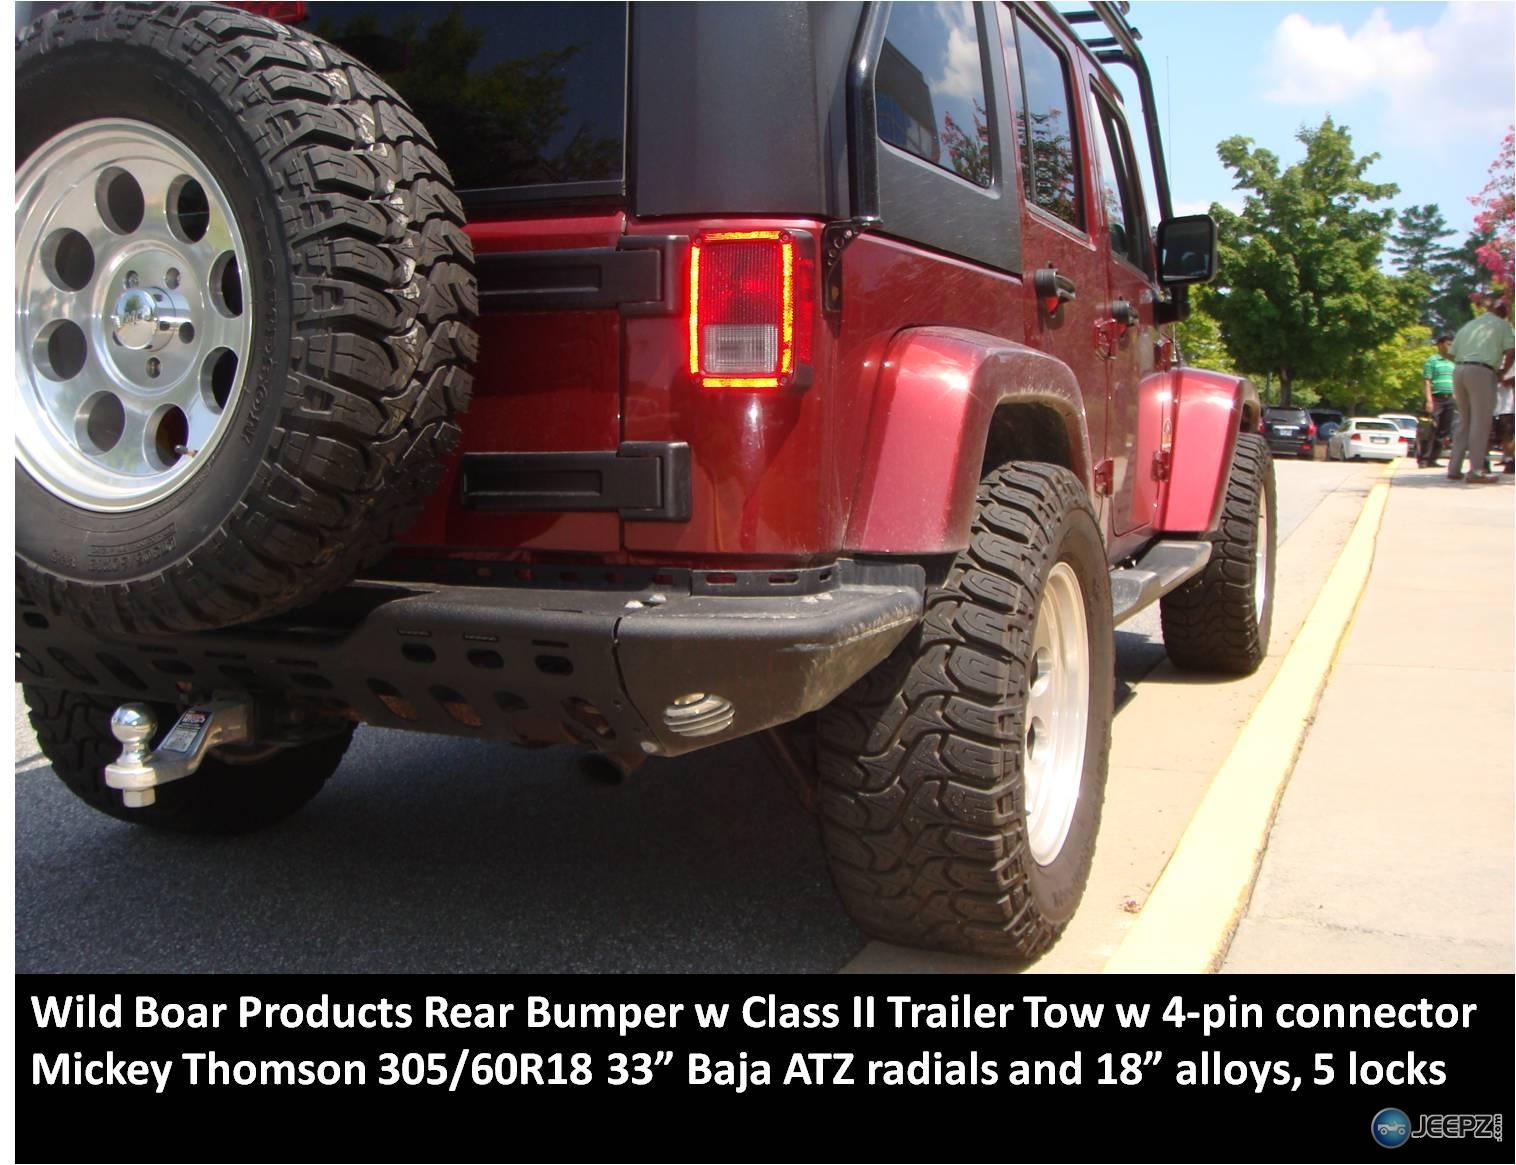 2007 jeep wrangler unlimited sahara 4x4. Black Bedroom Furniture Sets. Home Design Ideas